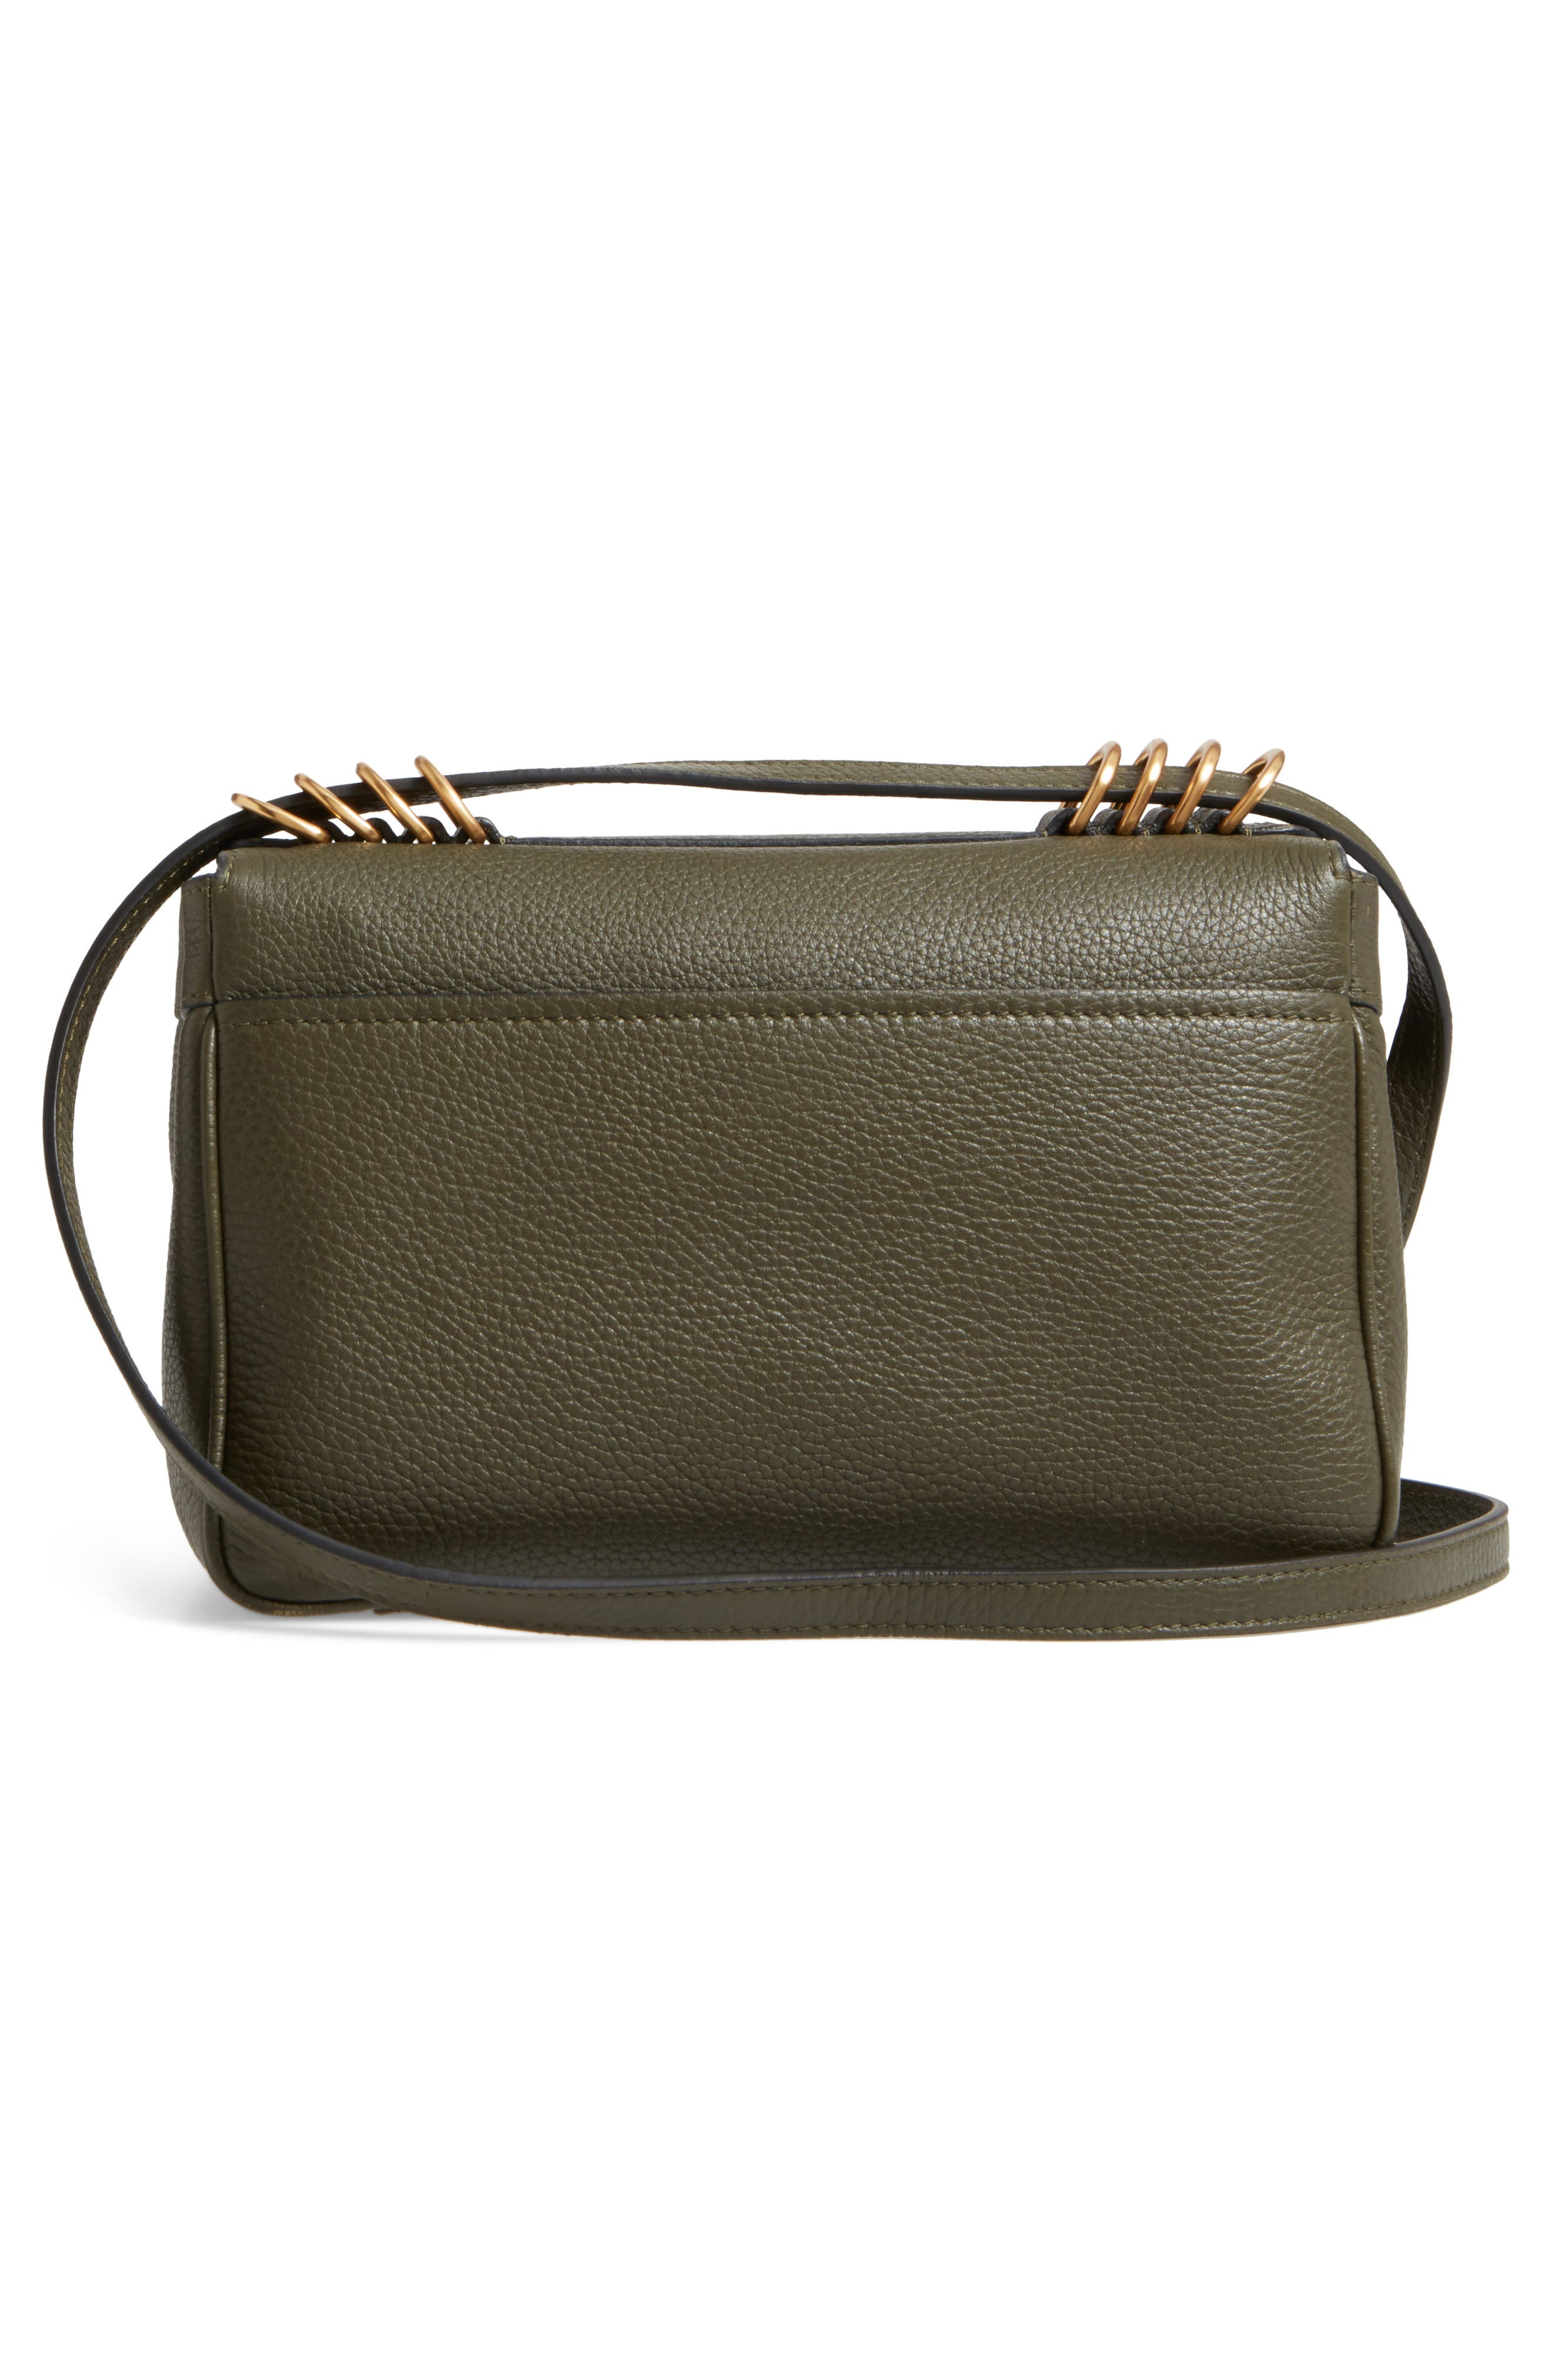 Grainy-B Leather Crossbody Bag,                             Alternate thumbnail 5, color,